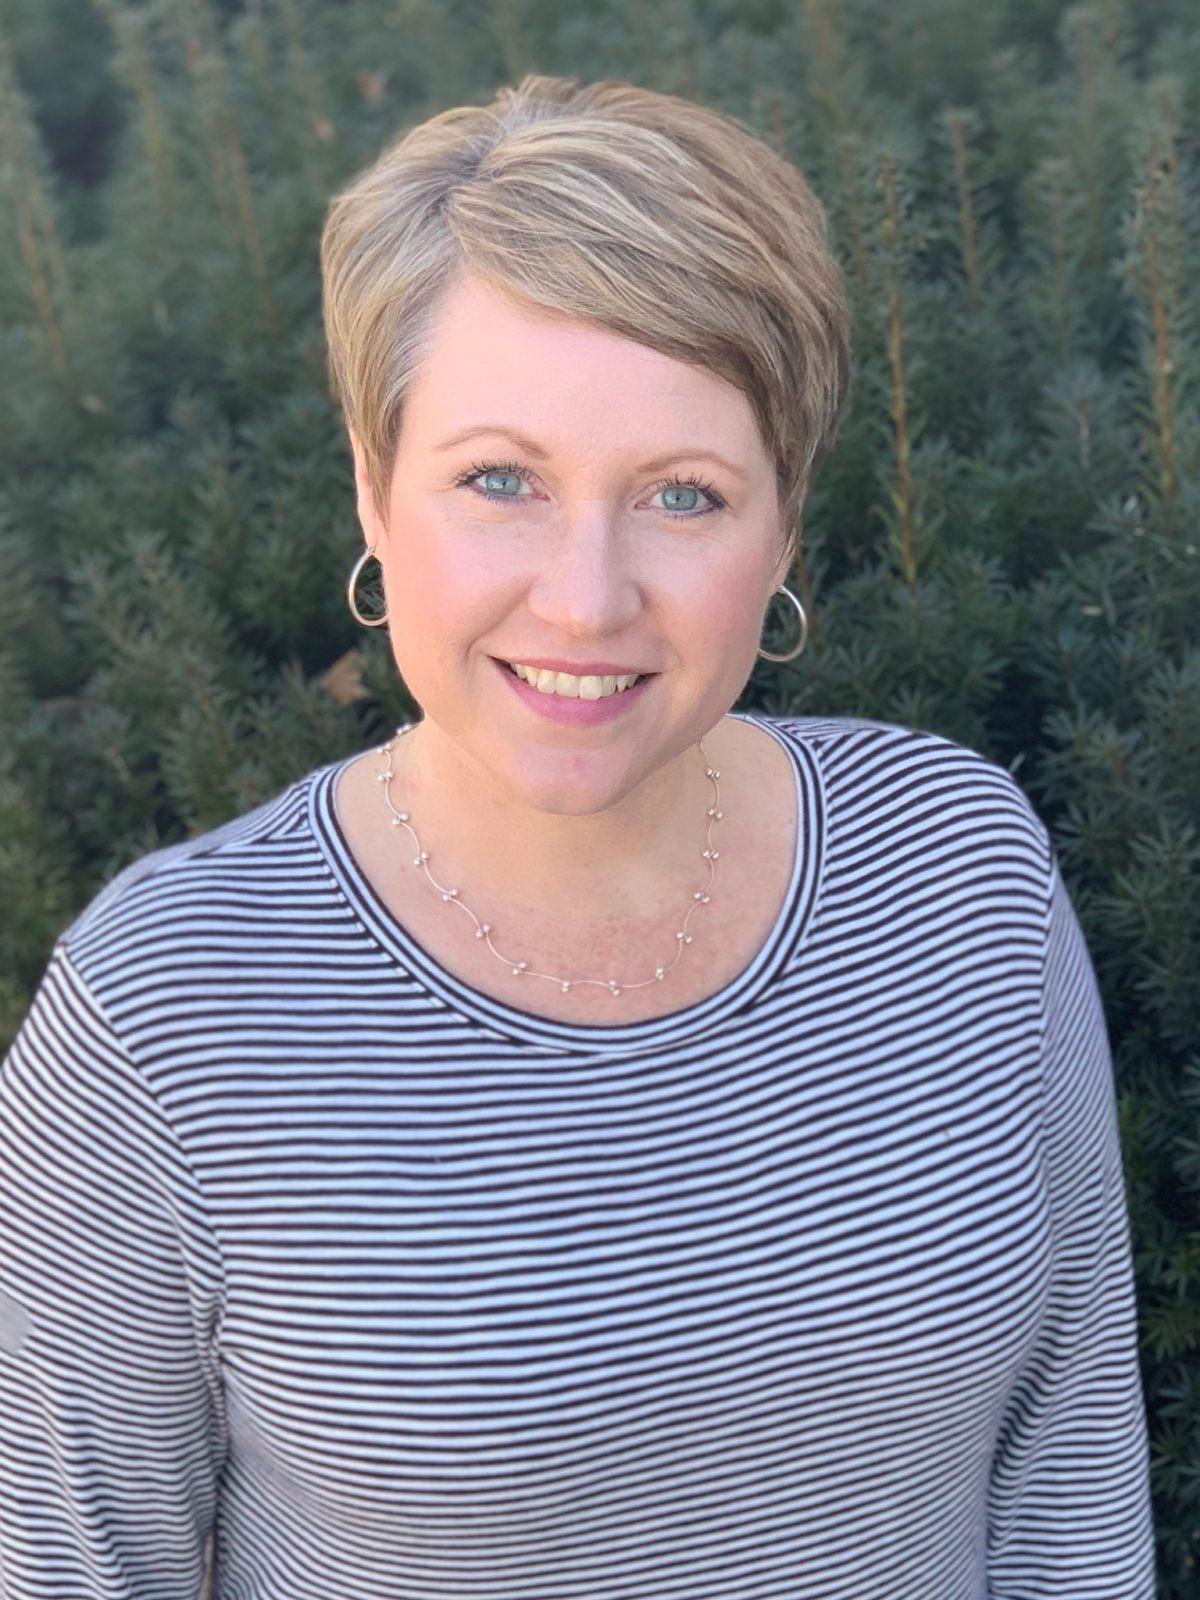 Jenny Winegarden, Program Director of The Arc of Southeast Iowa